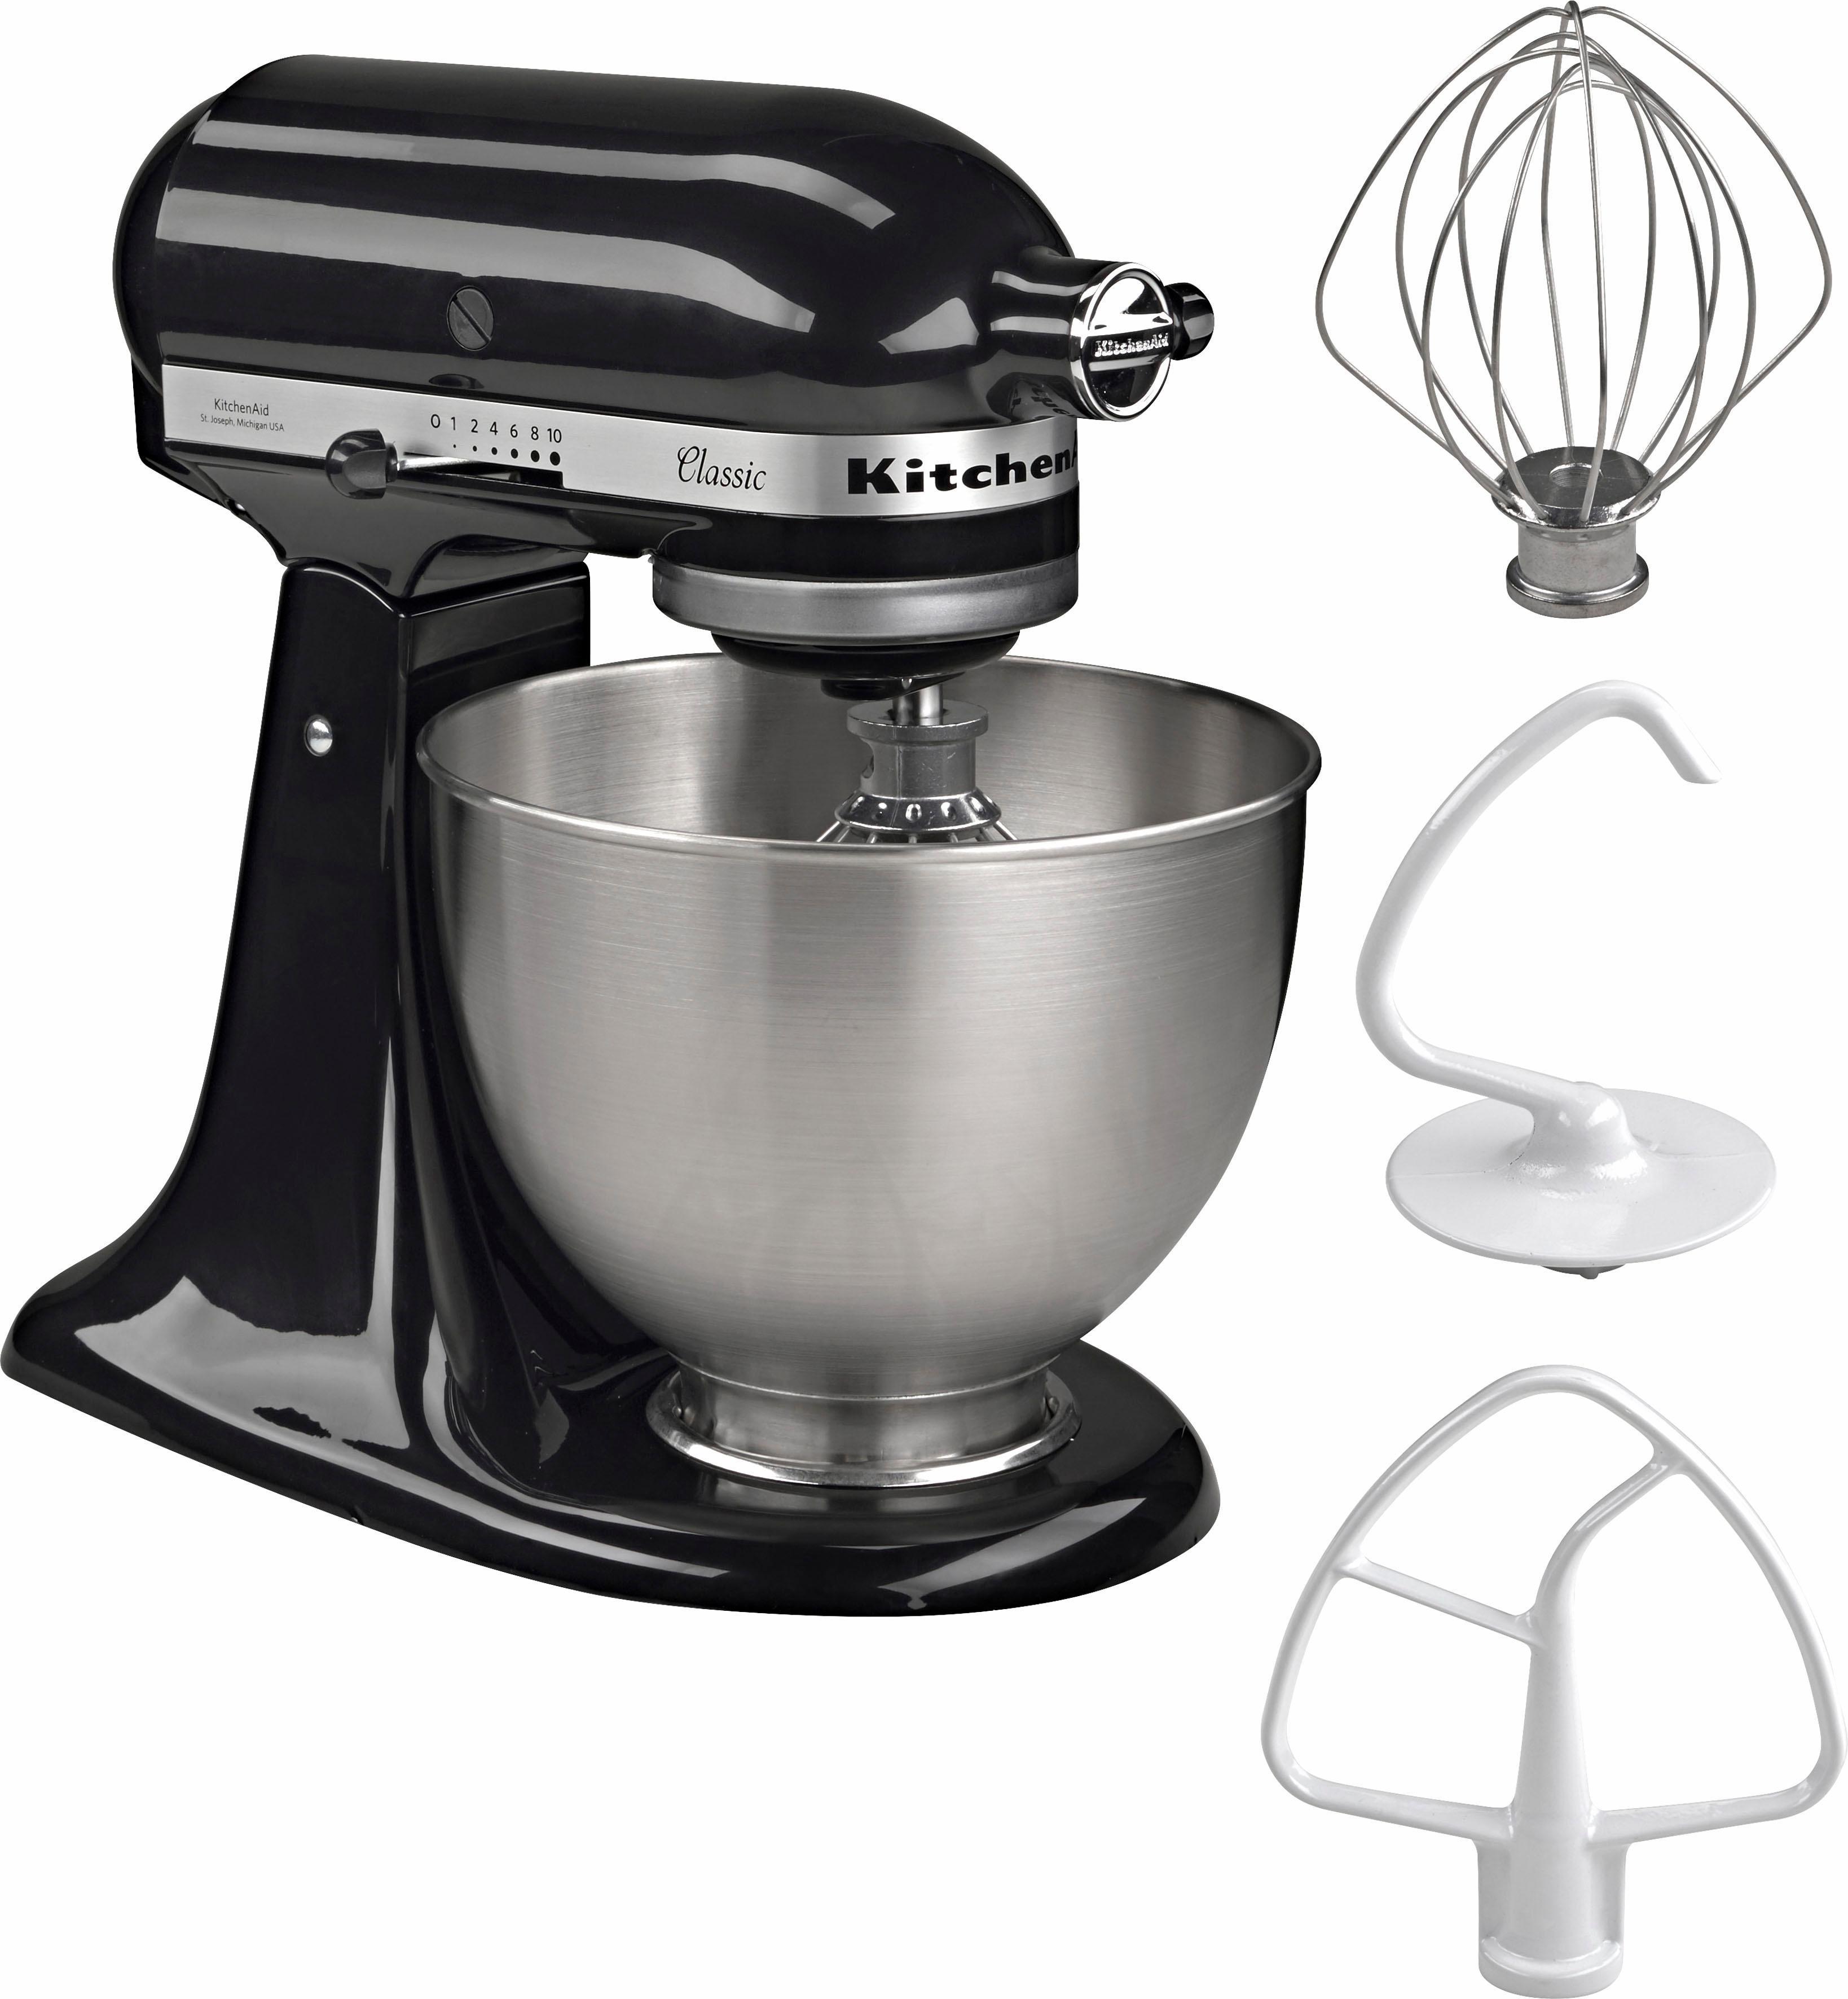 KitchenAid keukenmachine Classic 5K45SS EOB, 250 W, 4,28l-kom, incl. accessoires t.w.v. ca. € 112,- bij OTTO online kopen